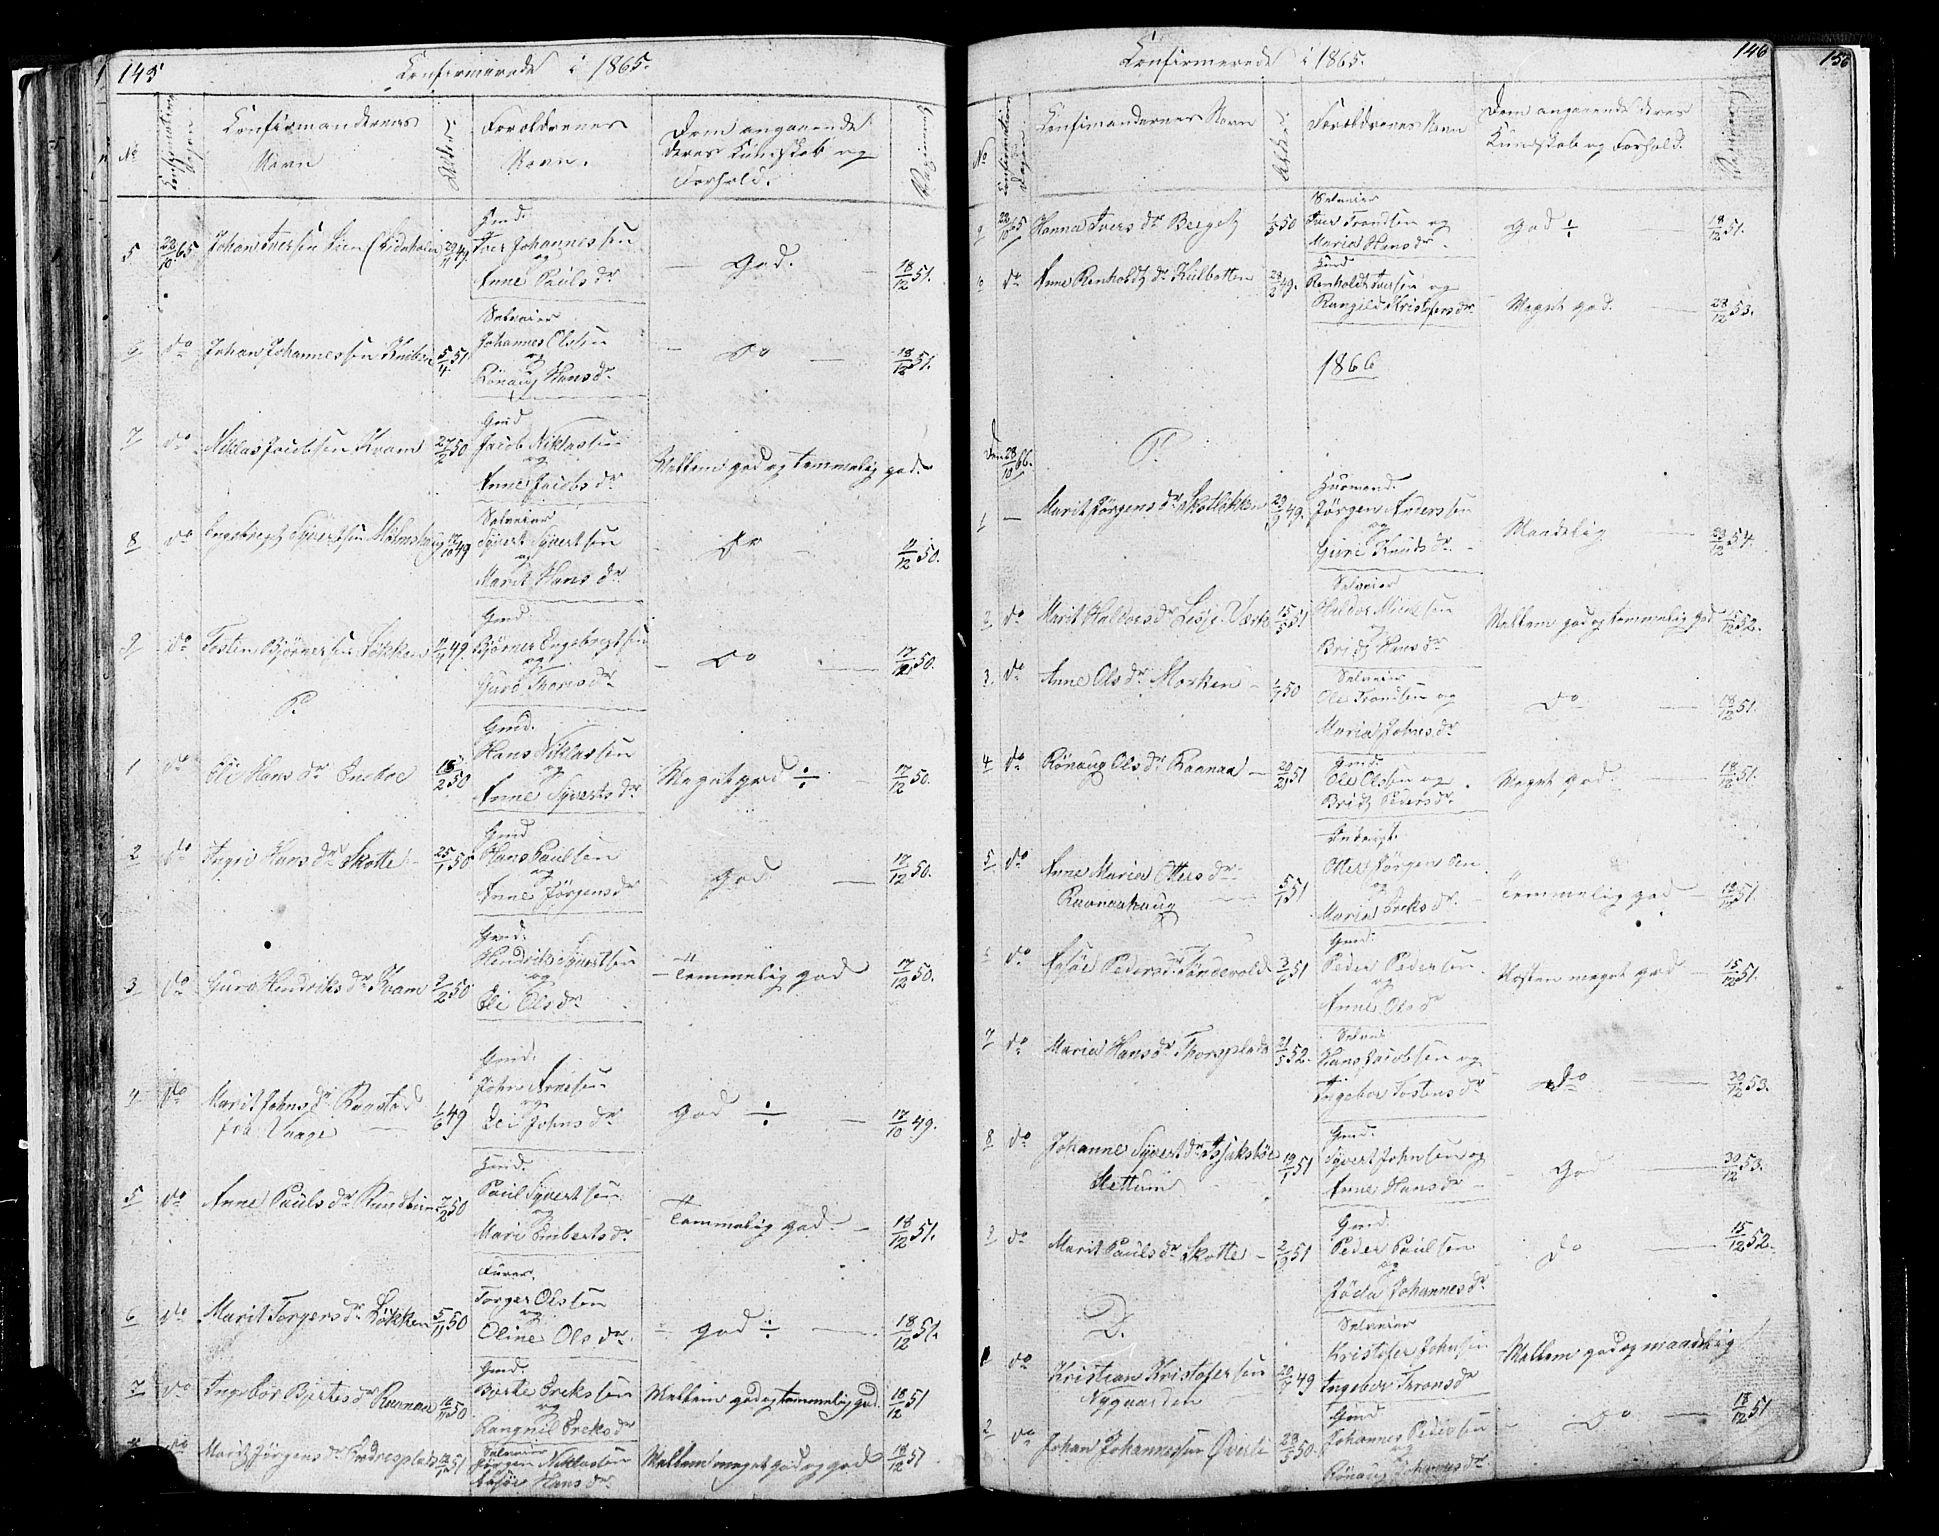 SAH, Lesja prestekontor, Klokkerbok nr. 4, 1842-1871, s. 145-146